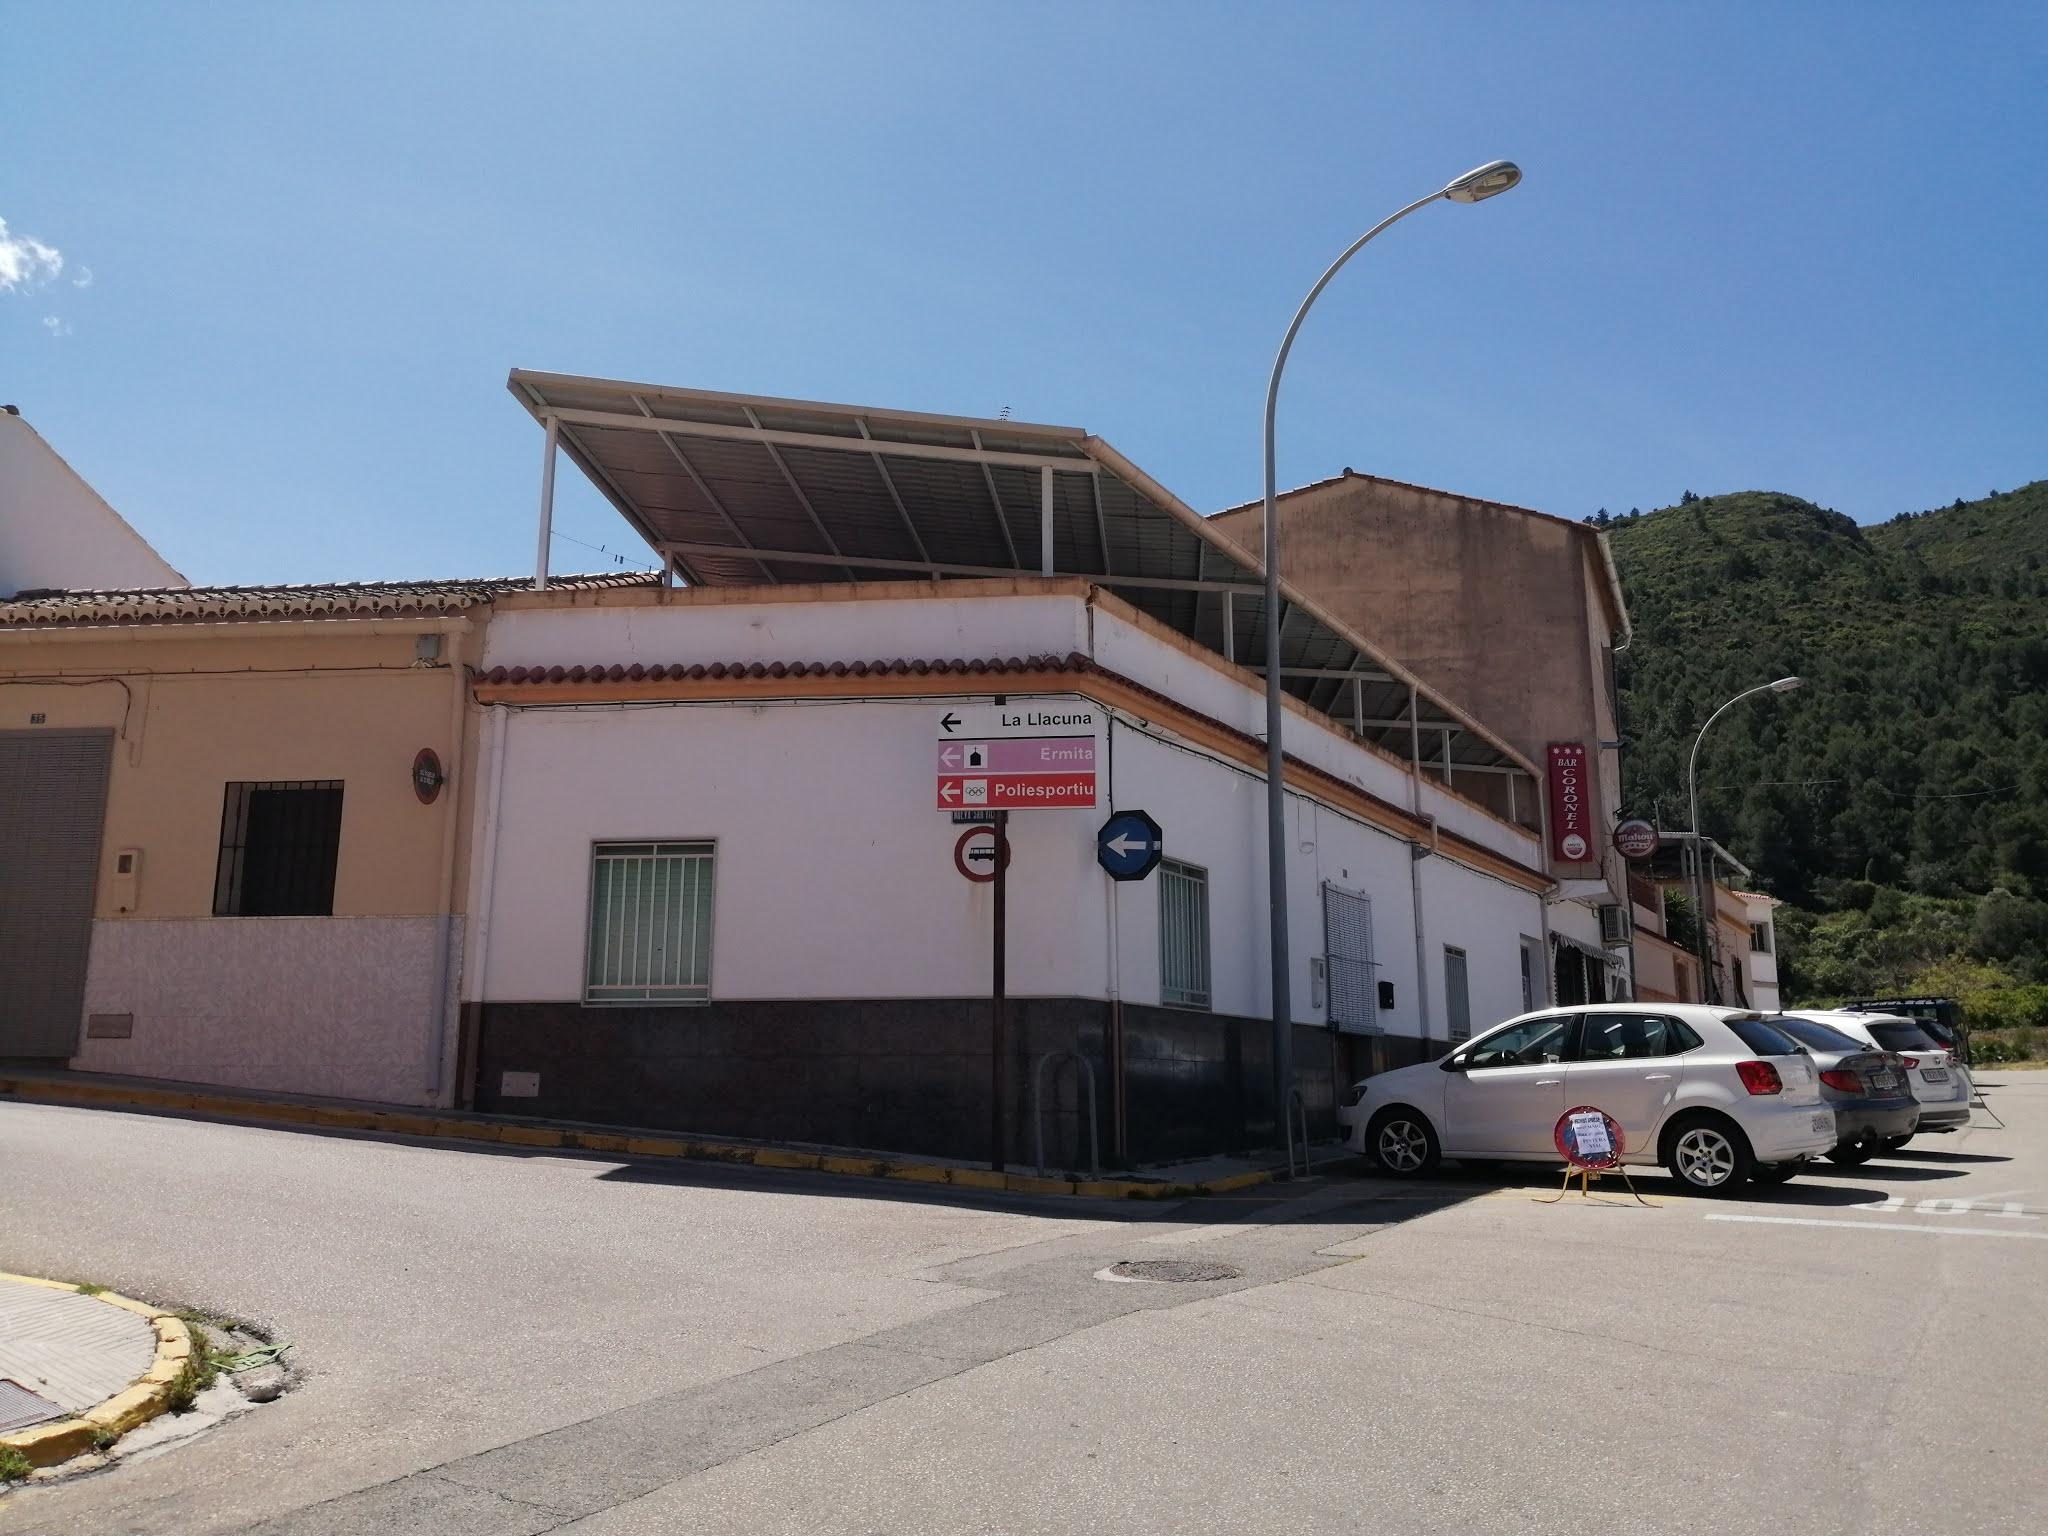 Signpost indicating la Llacuna in Villalonga, Valencia, Spain